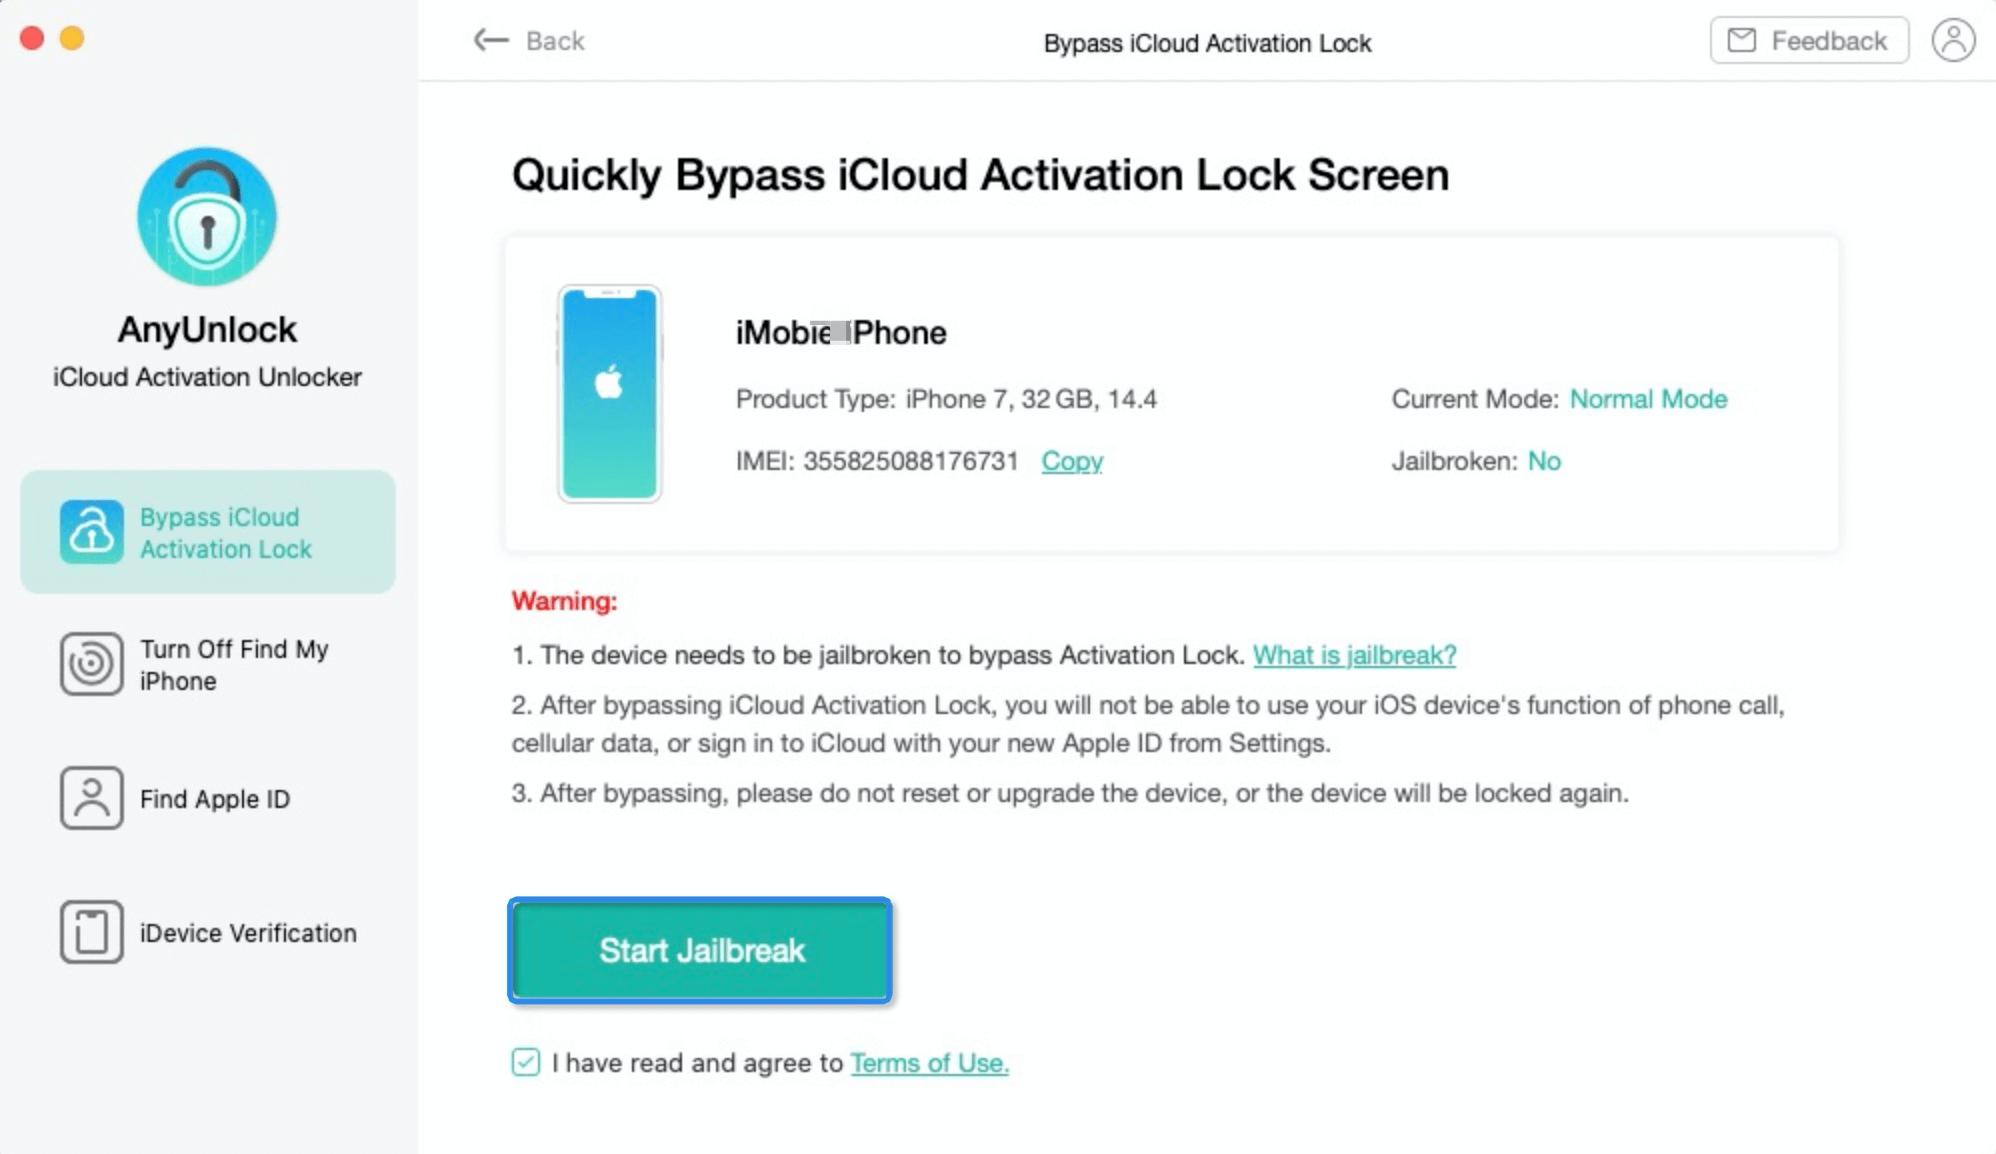 Quick Bypass iCloud Activation Lock Screen interface